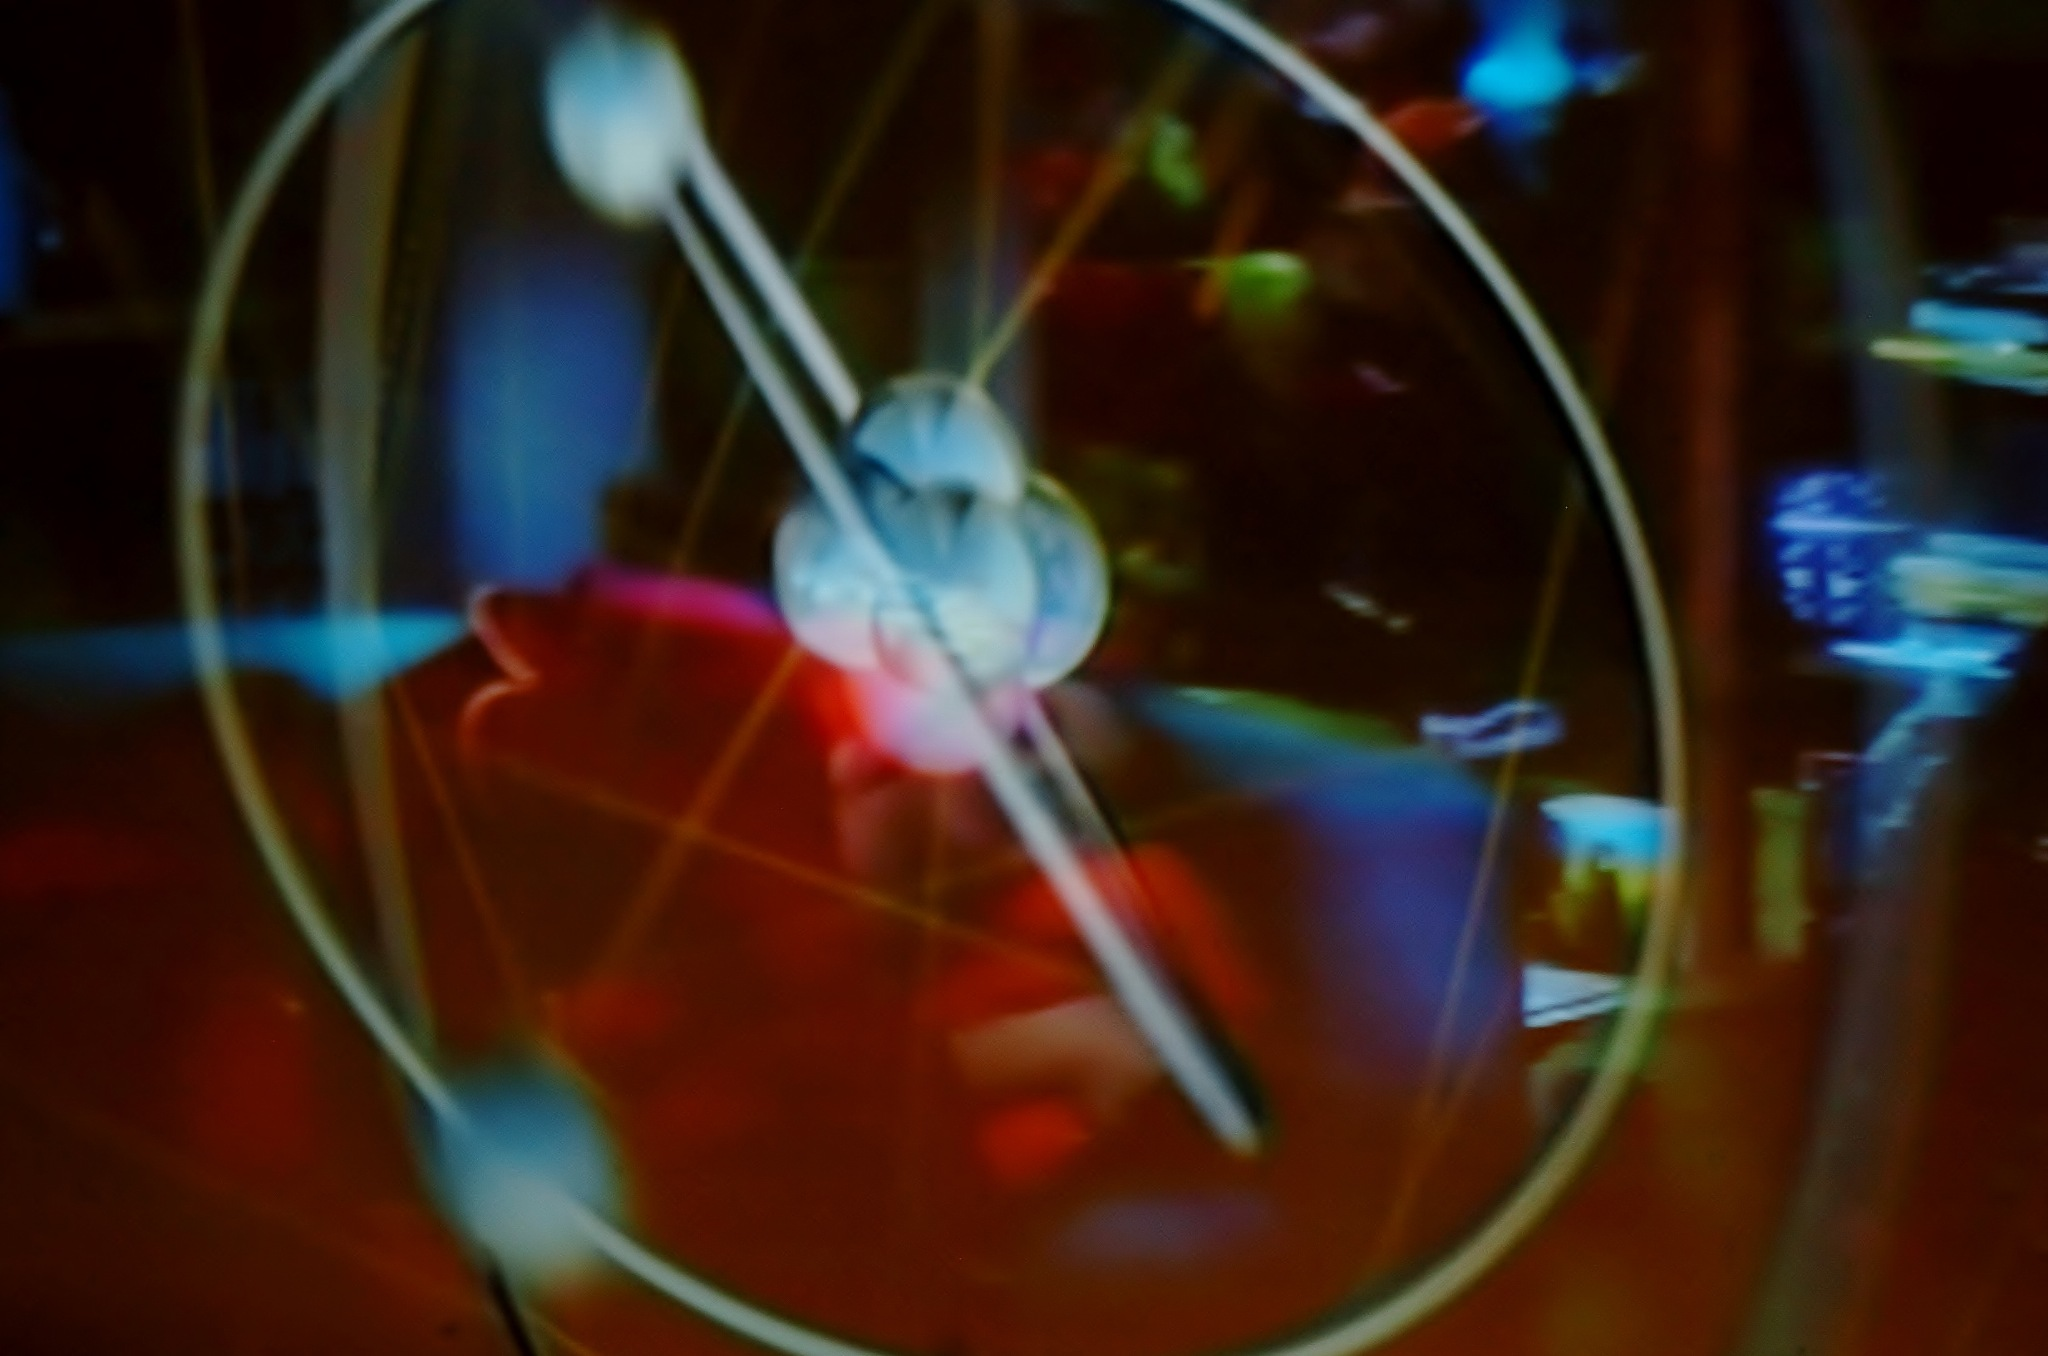 Untitled by Paul Tetloff